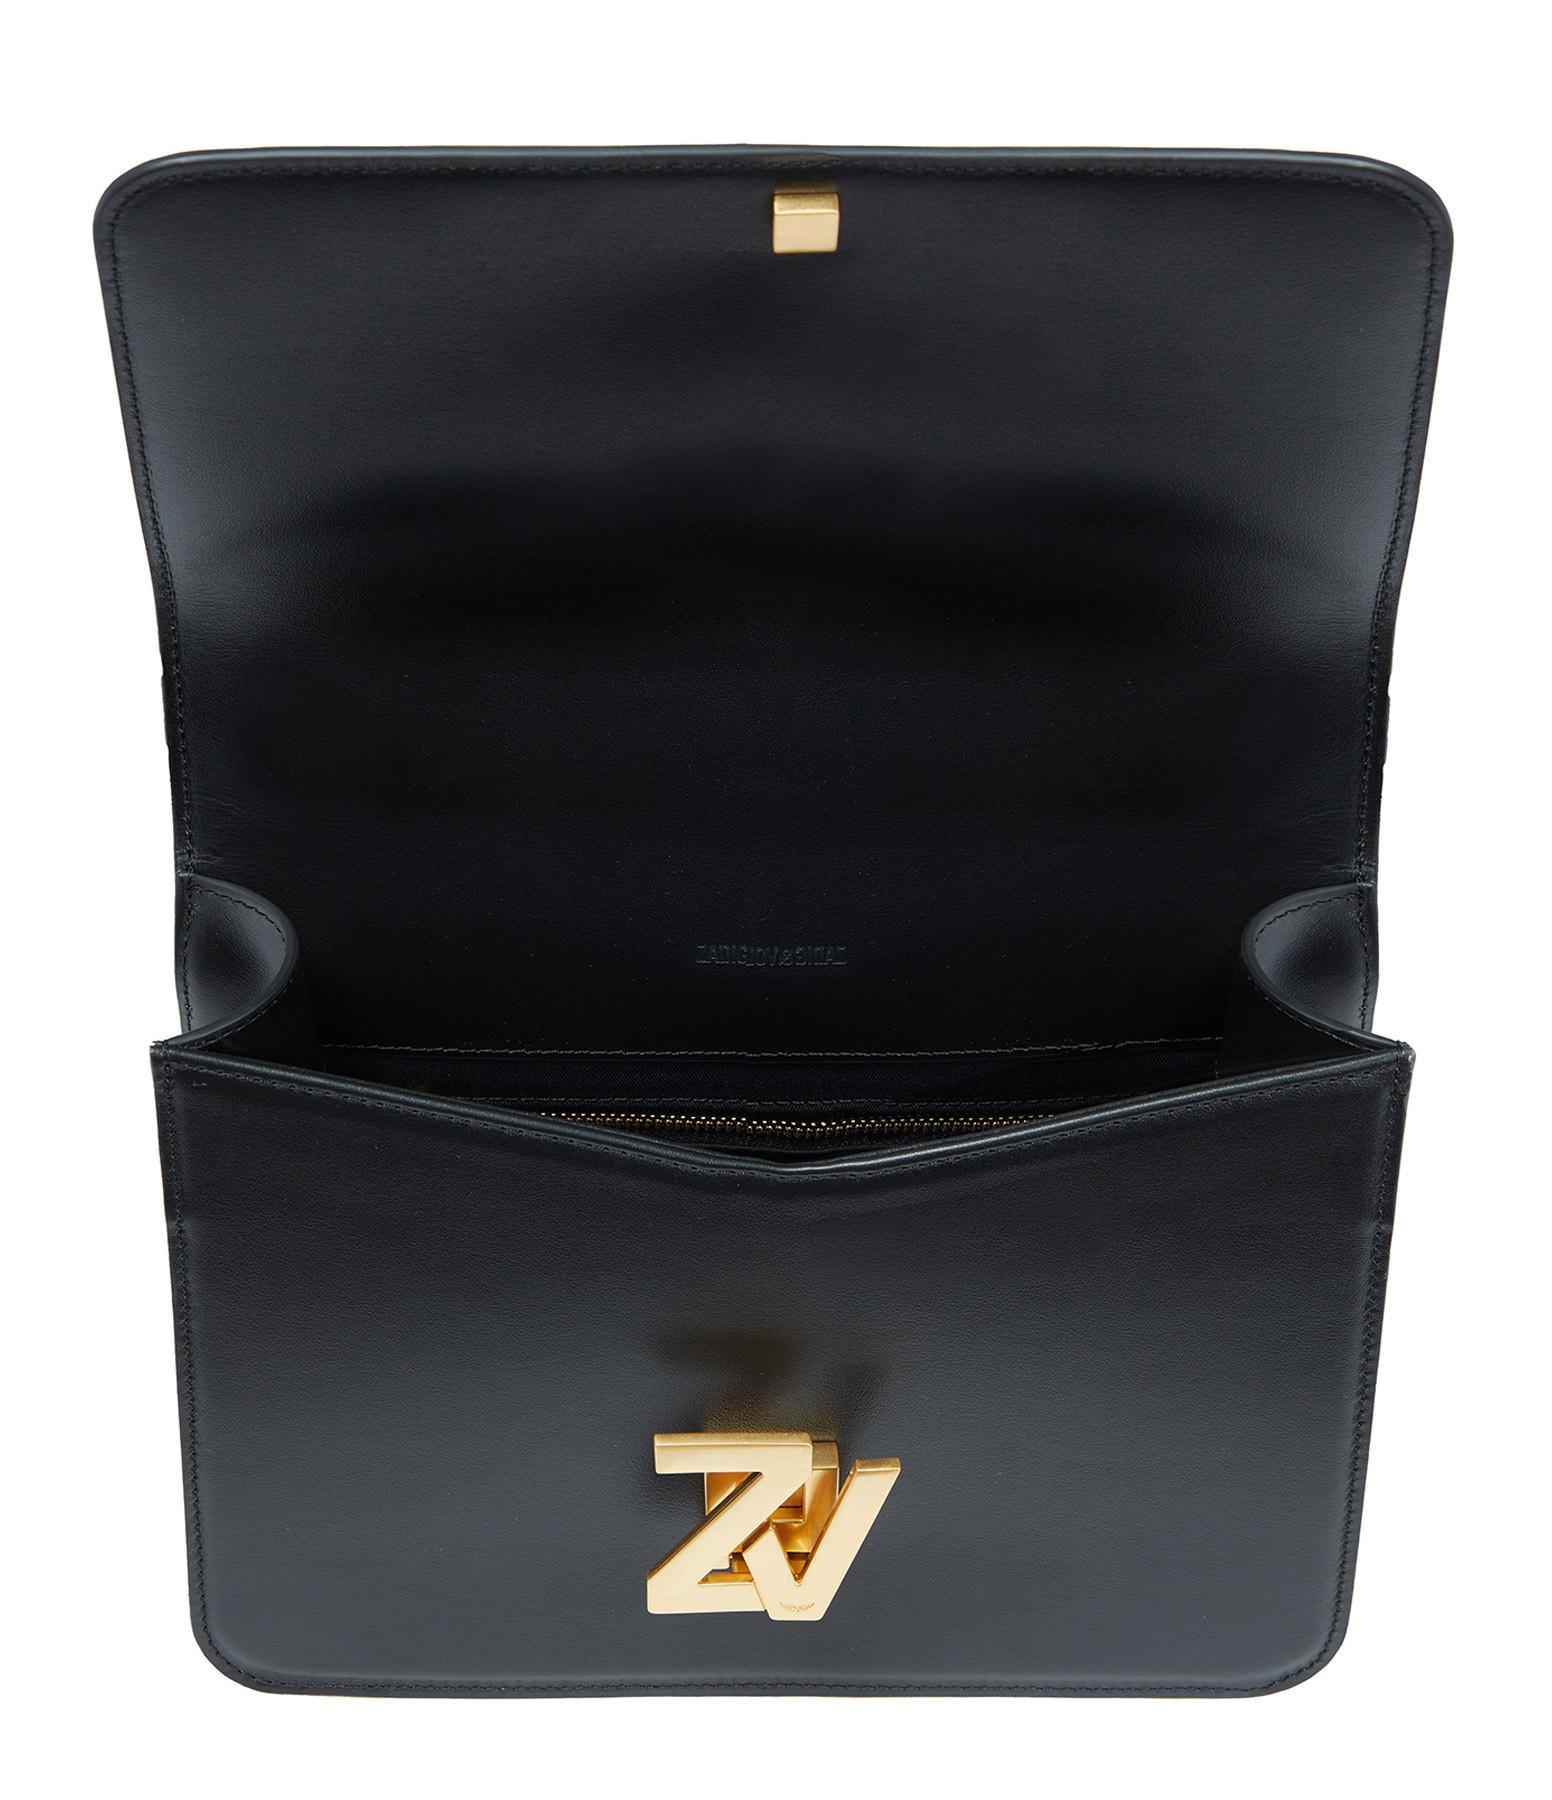 ZADIG & VOLTAIRE - Sac ZV Initiale CIT Cuir Noir